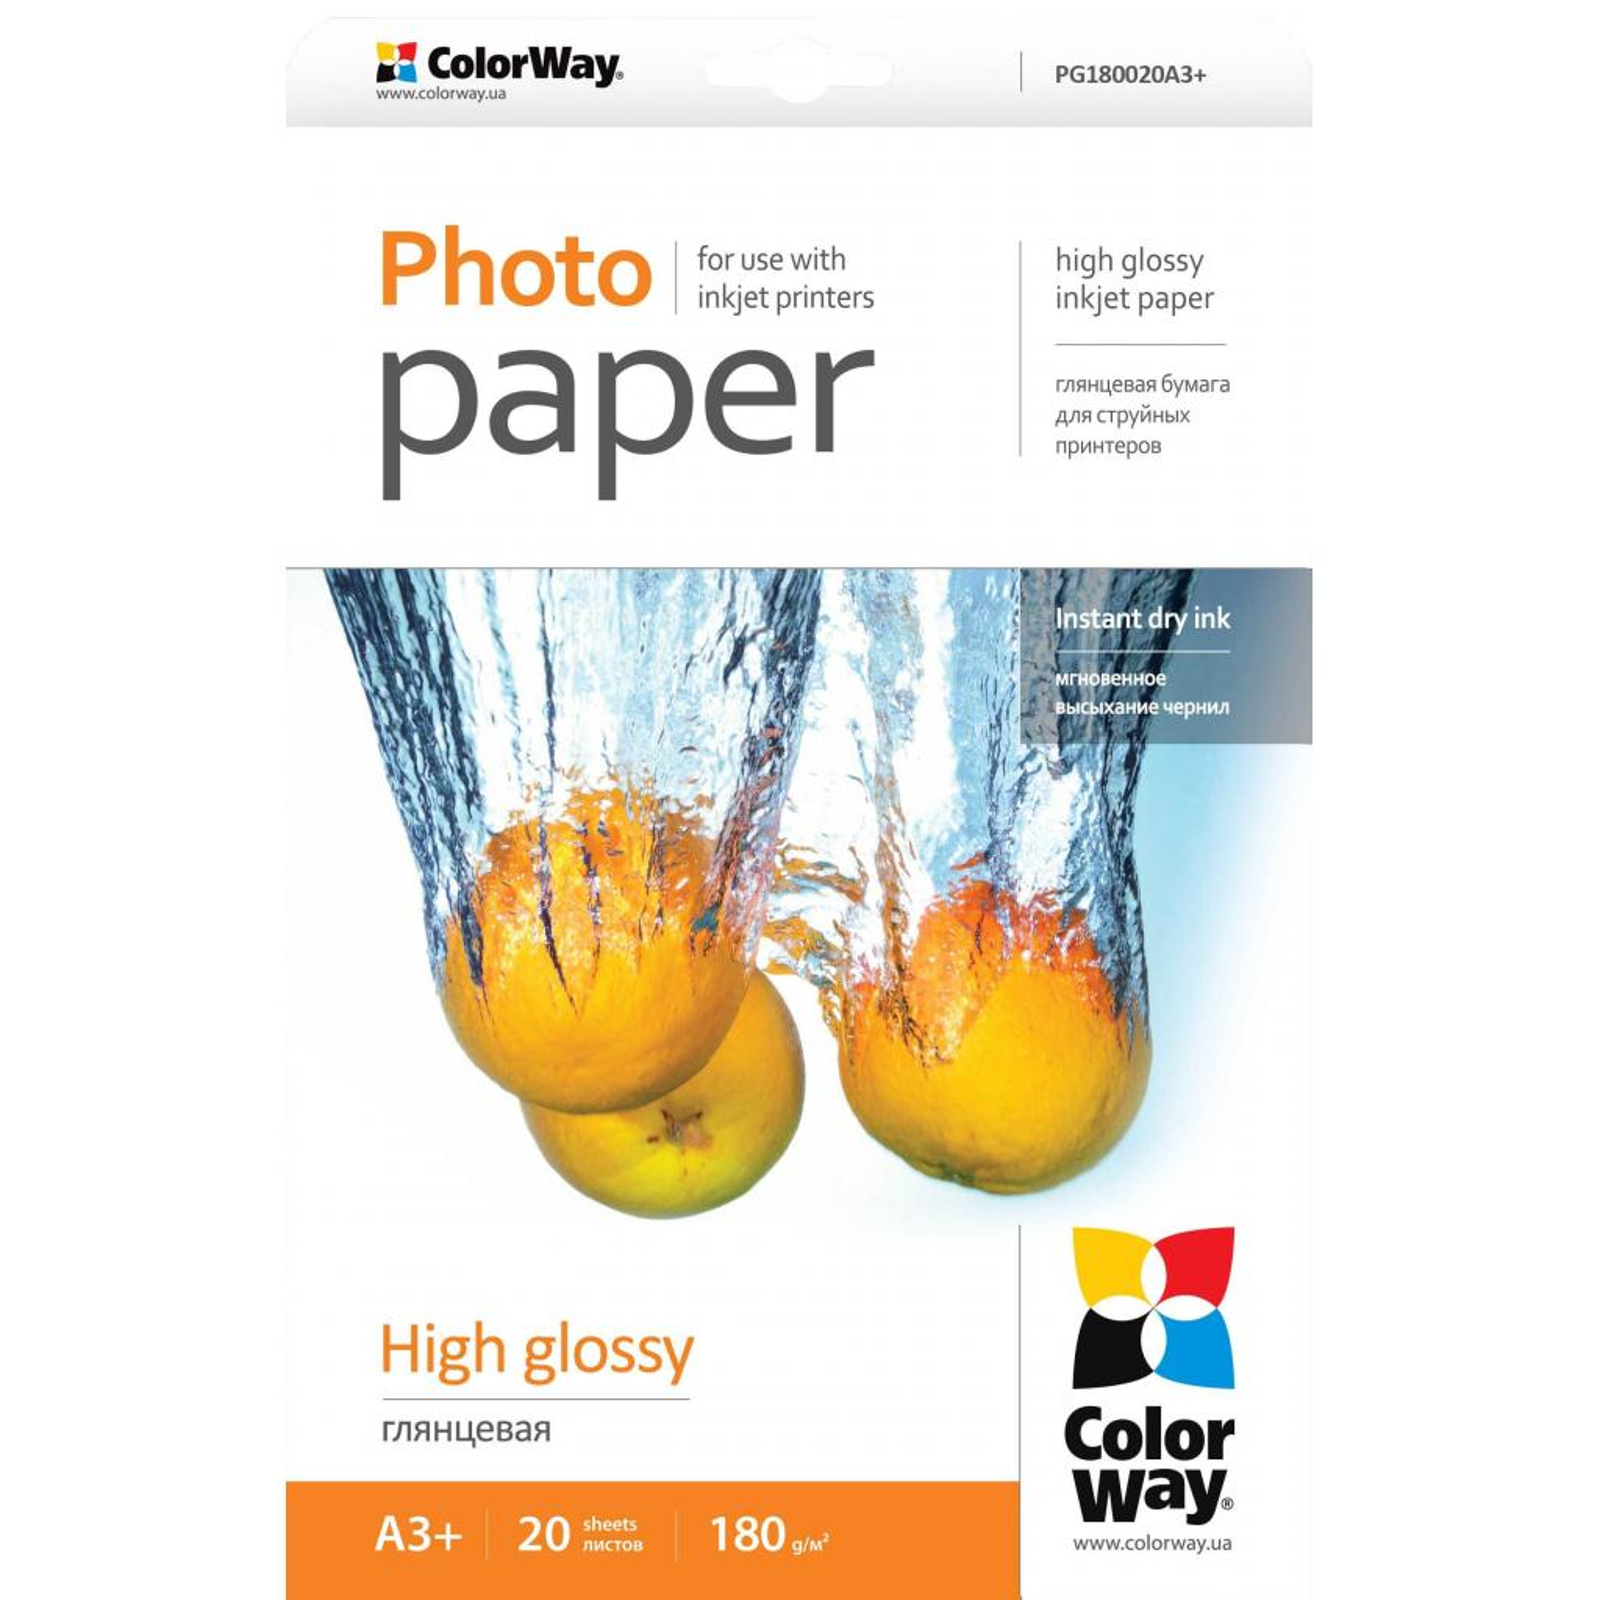 Бумага ColorWay A3+ (ПГ180-20) (PG180020A3+)